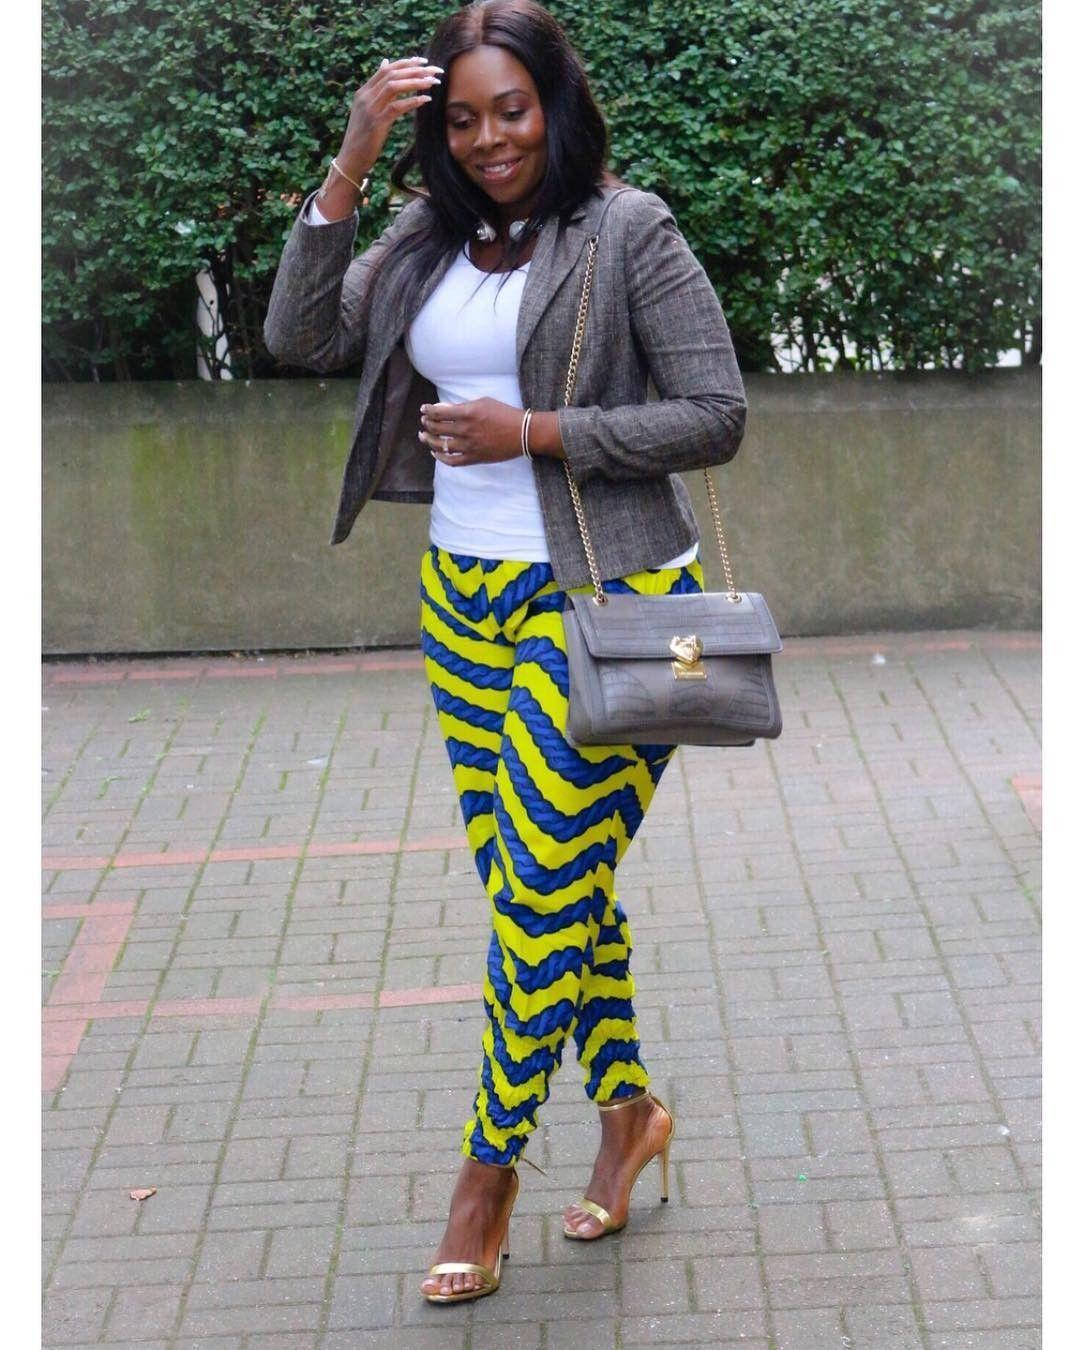 ff73949bdf21 Stylish Ankara statement trousers for women #spring #ankara #womenswear  #womensfashion #makeup. Read it